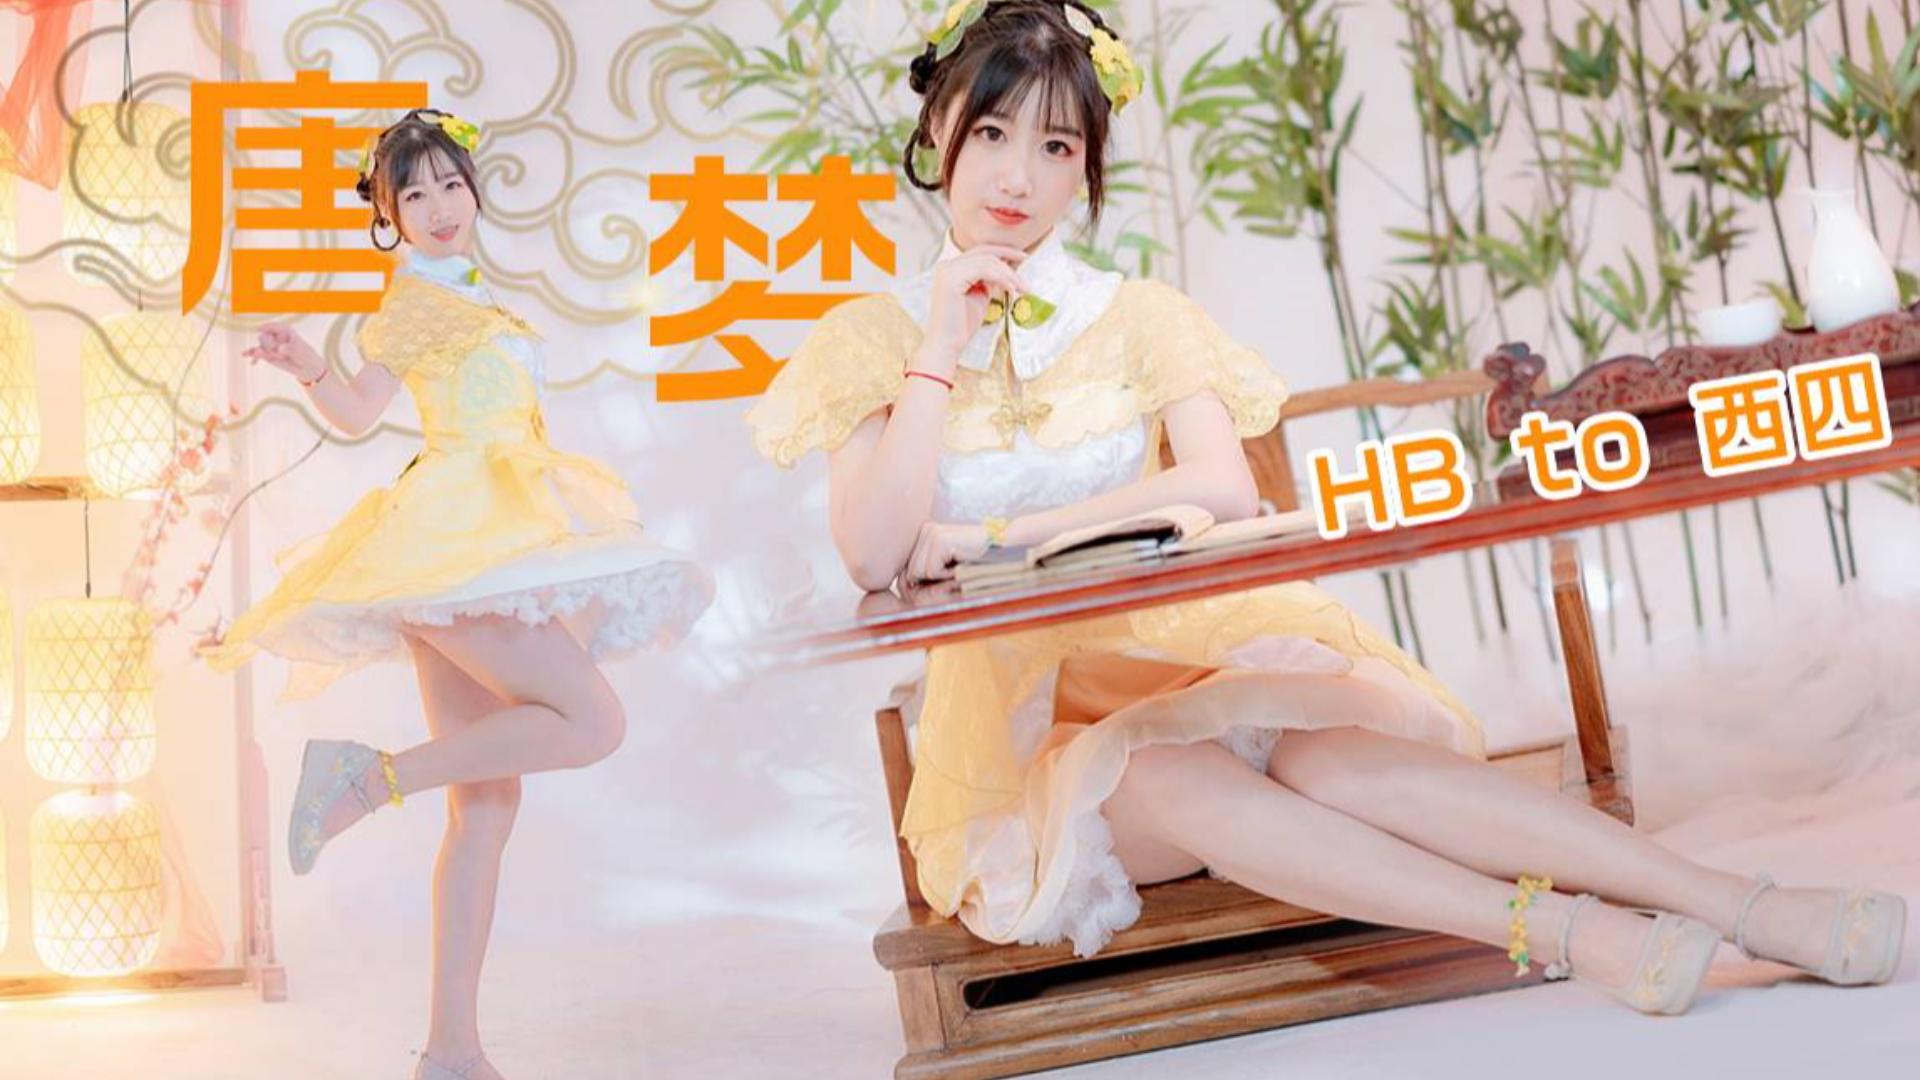 【HB to 西四】❀唐梦❀跟我一起做梦为四姐庆生吧~【西四编舞】【柿子】